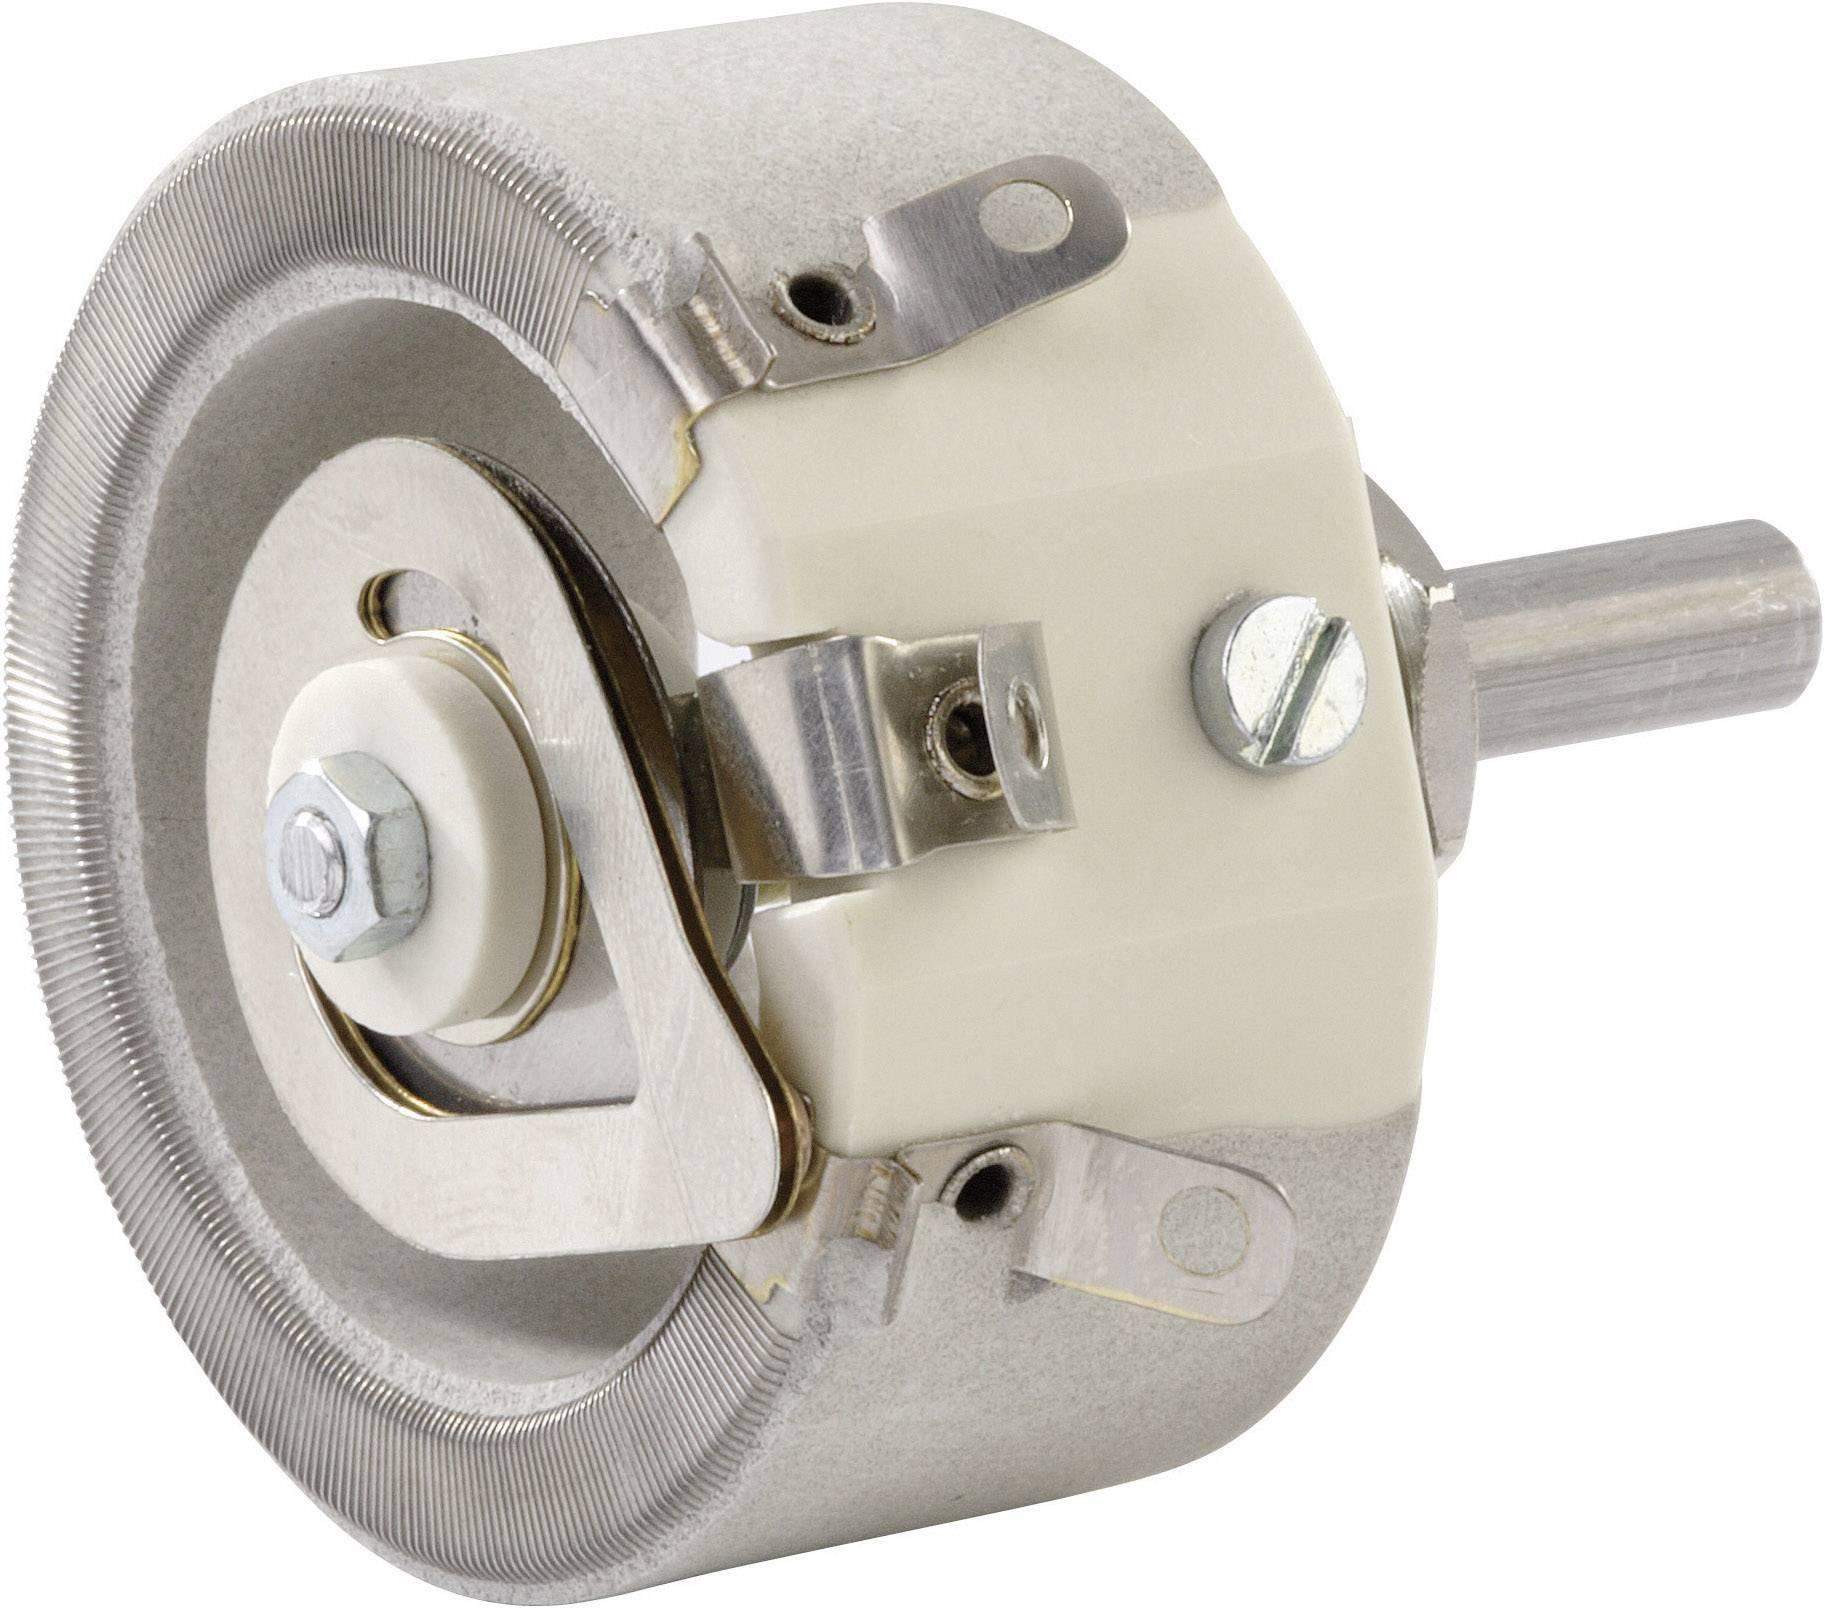 Drôtový potenciometer mono TT Electronics AB 3191106800 3191106800, 30 W, 470 Ohm, 1 ks